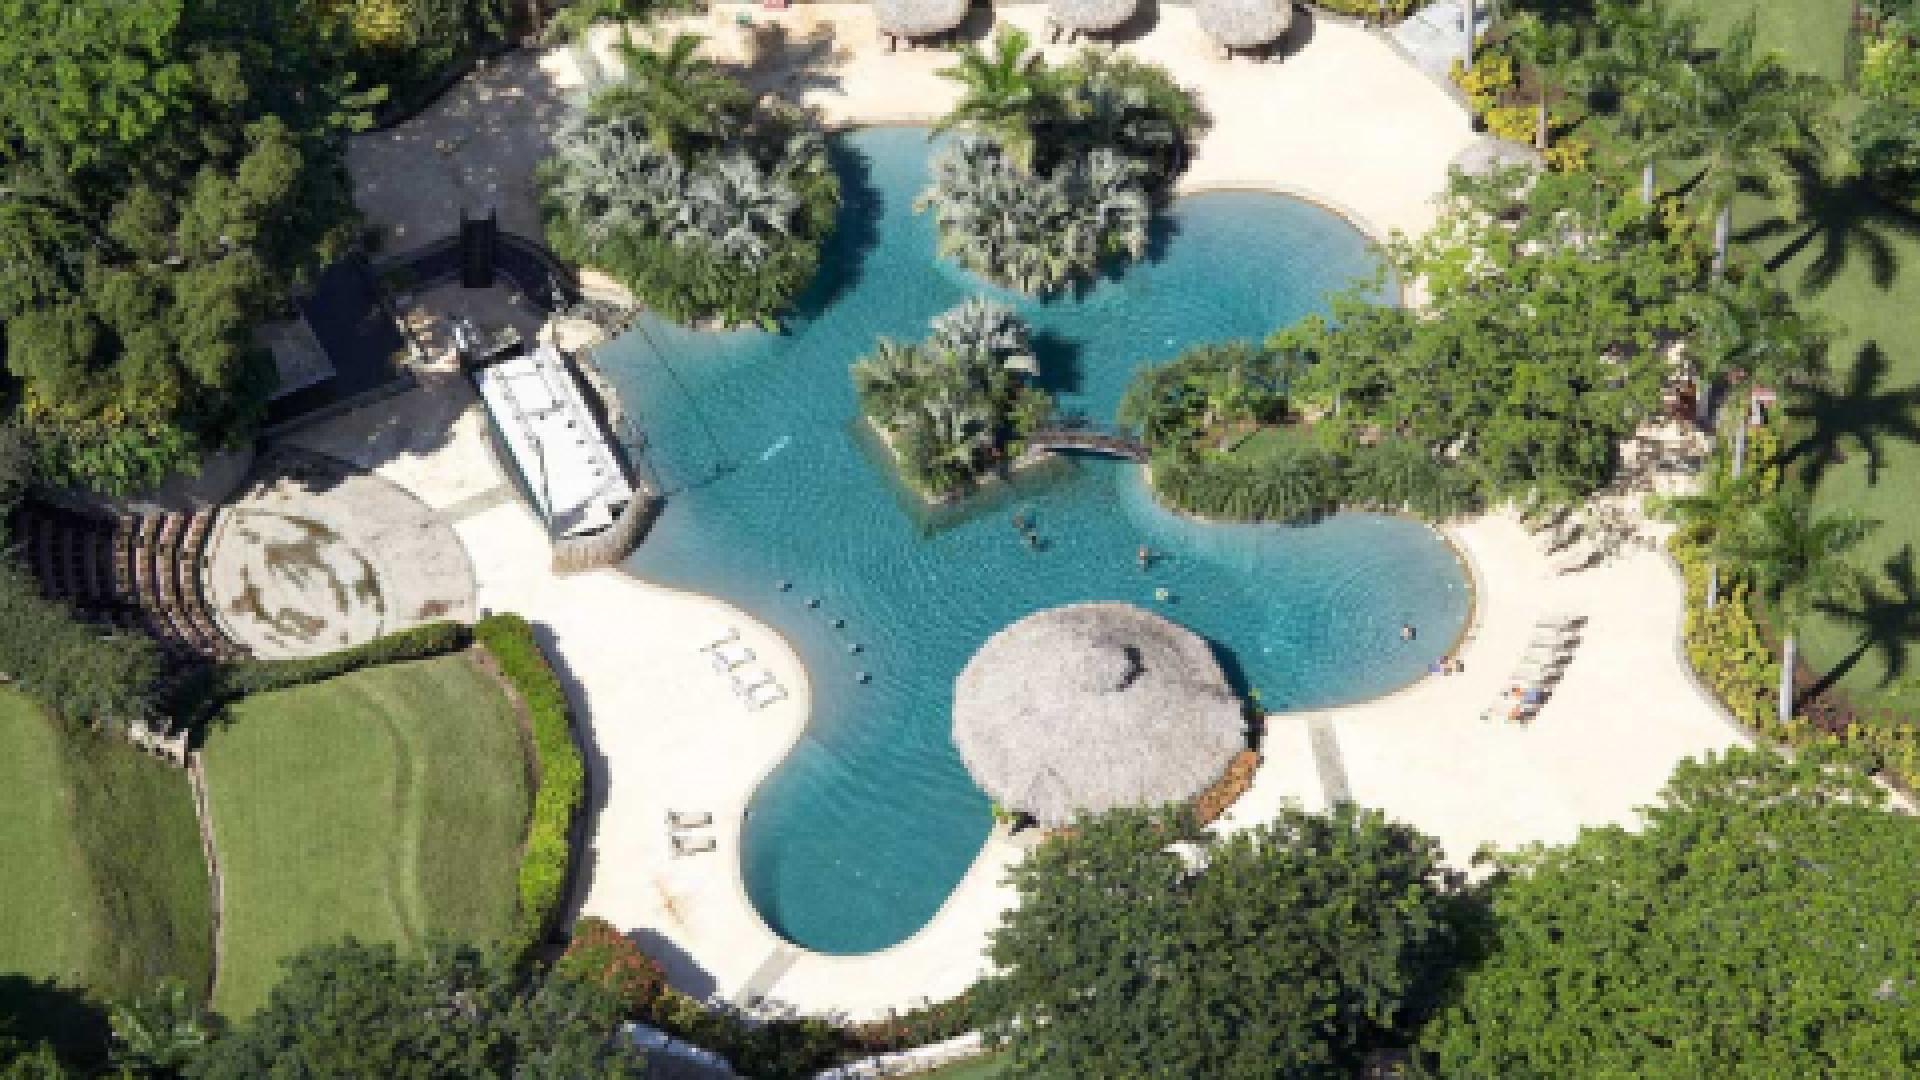 pool design,infinity pool,contemporary pool,pool service,Joan Roca